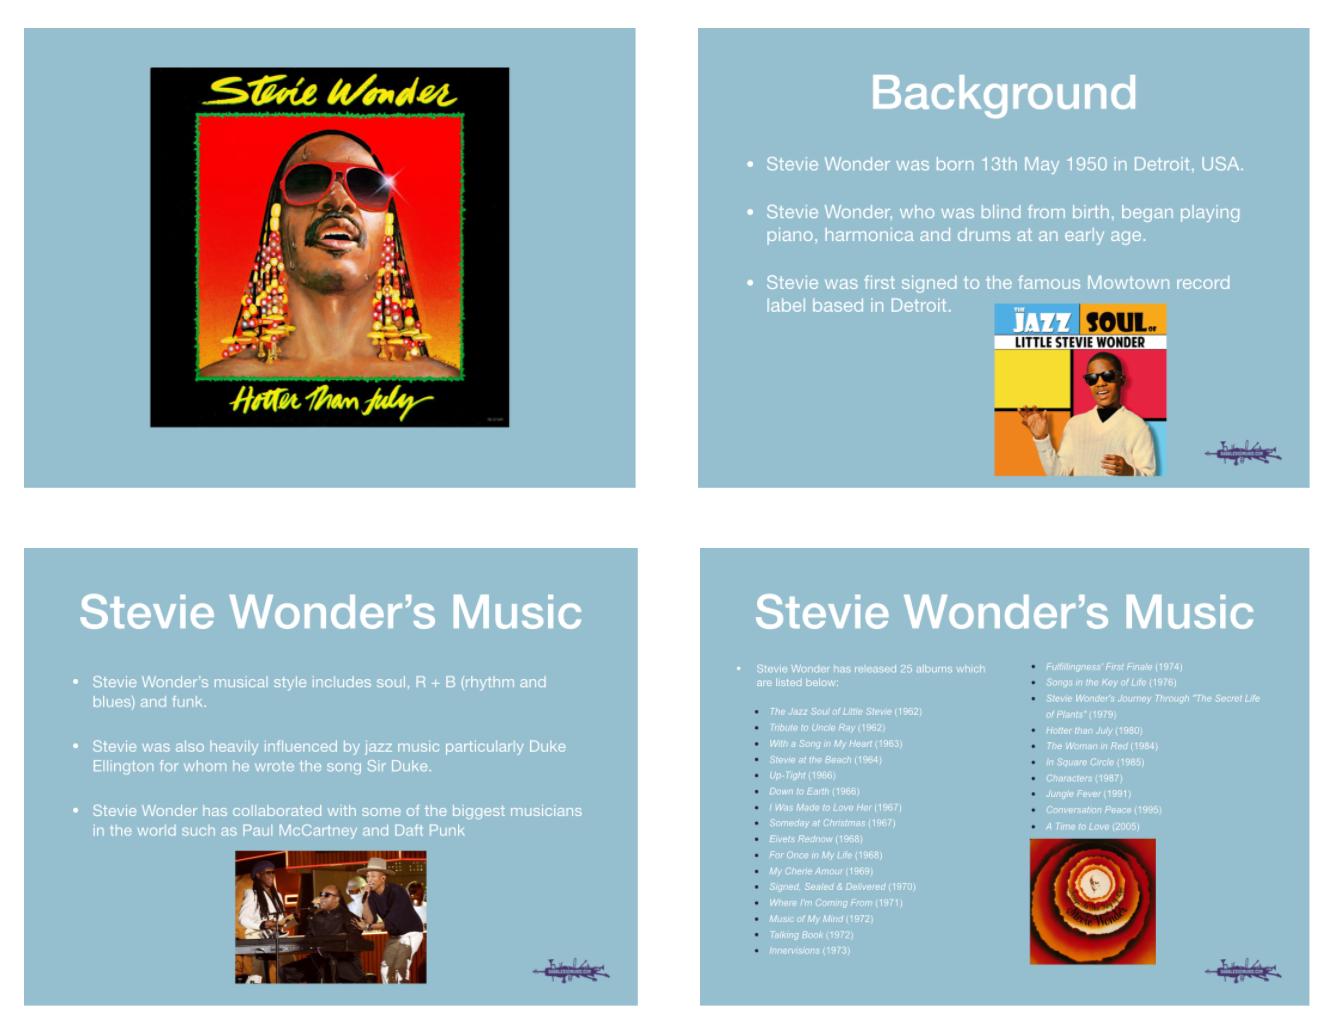 DabbledooMusic Artist Profile - making music at home